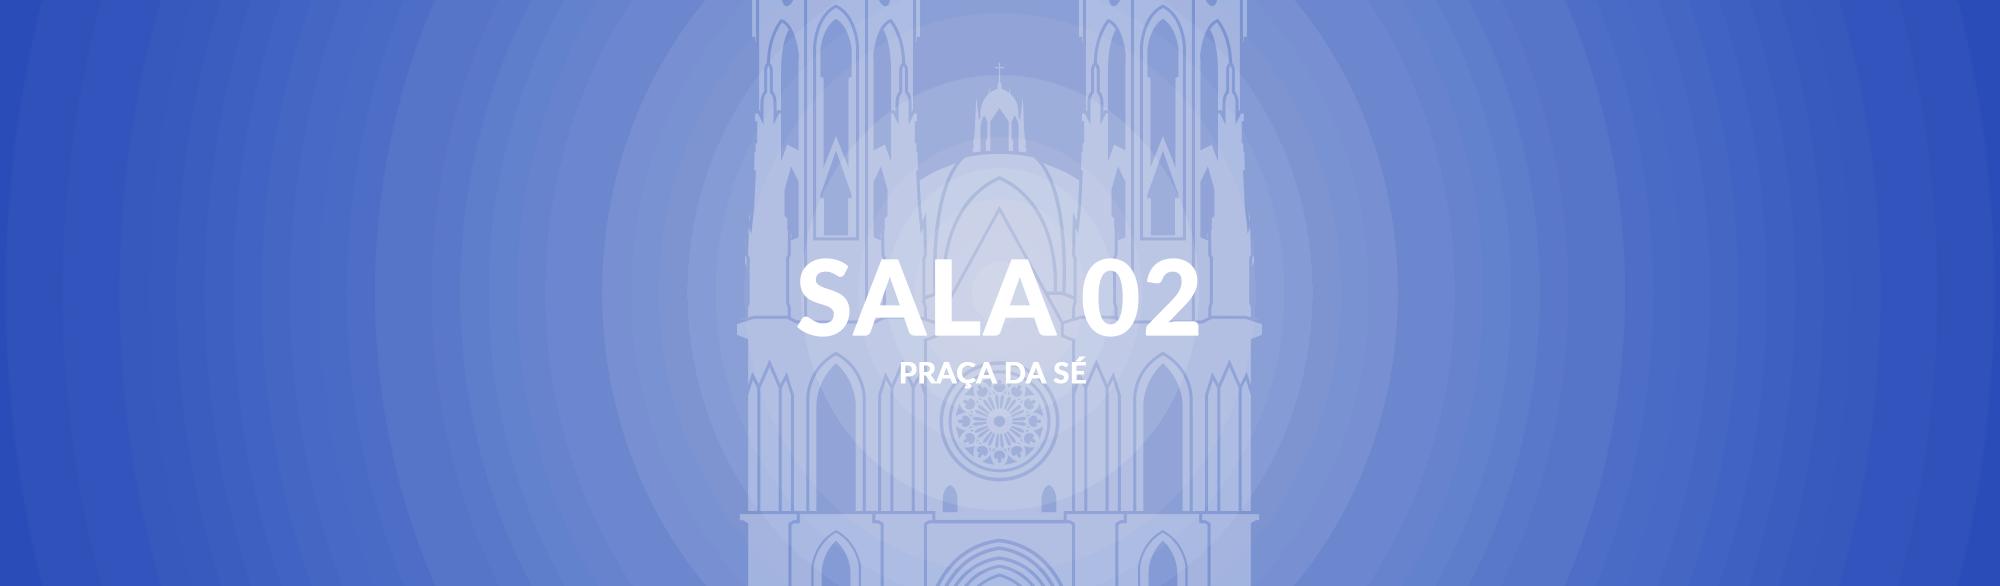 Banner dia02 sala02